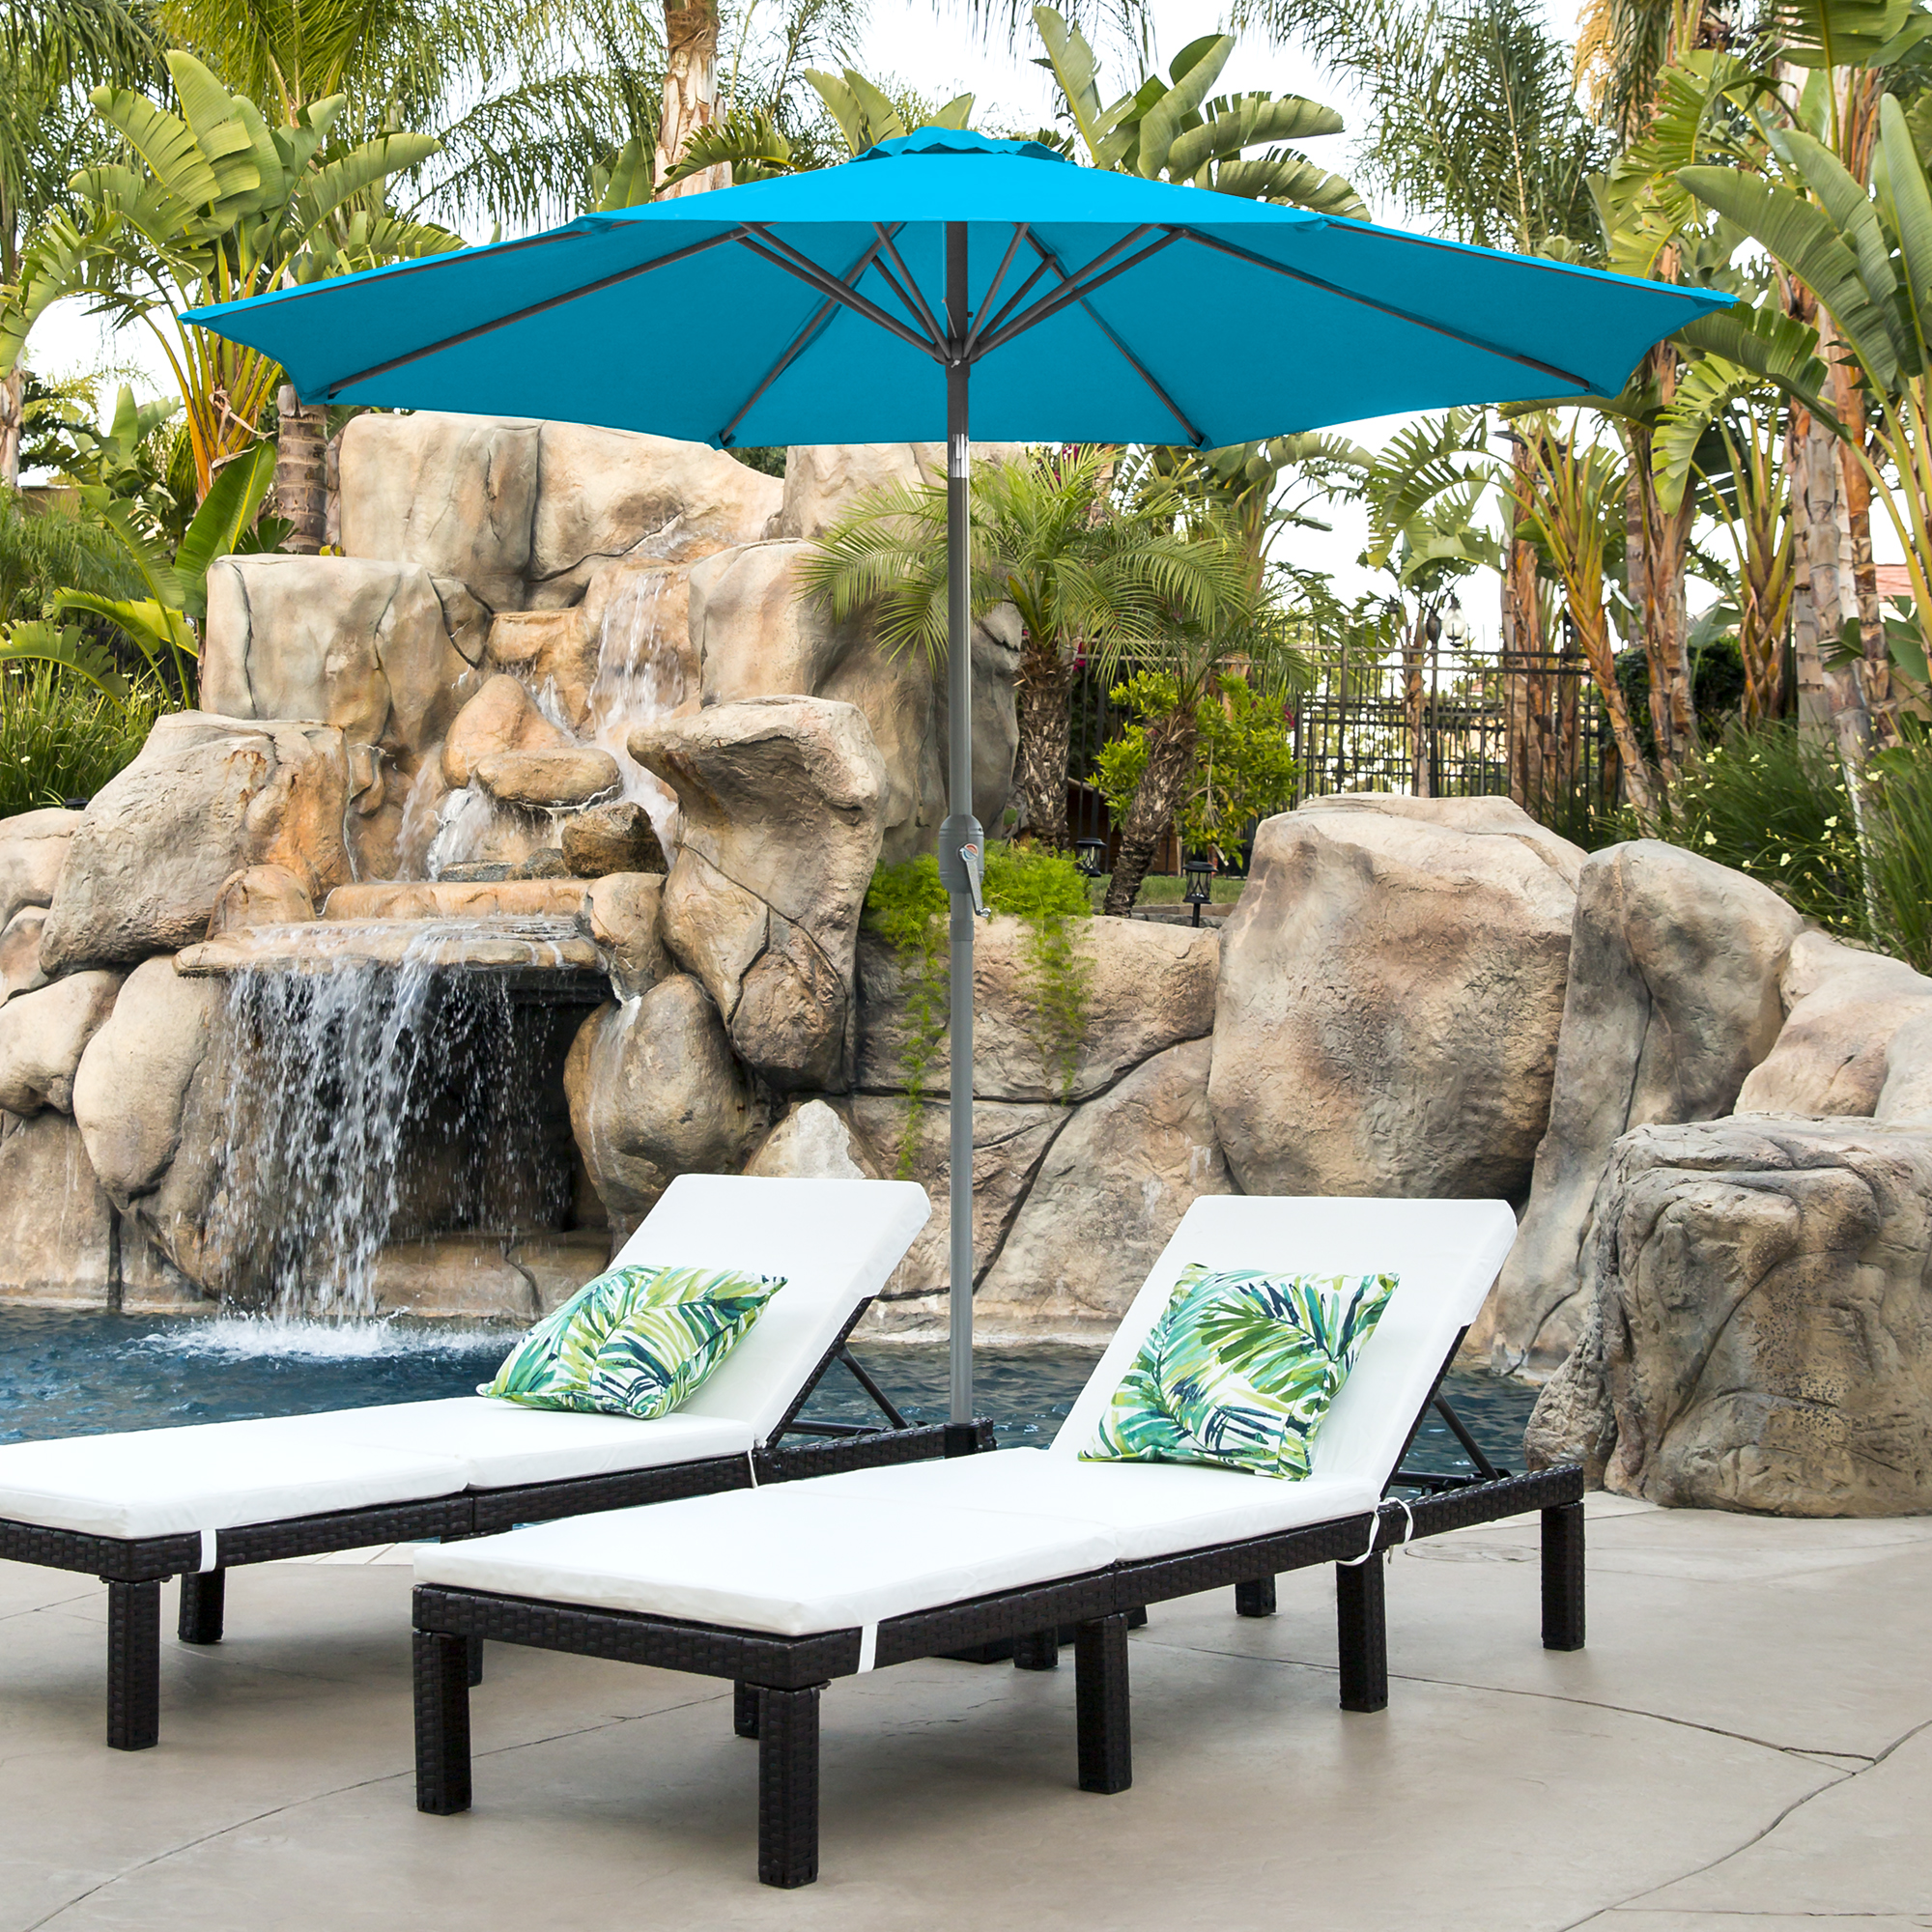 Wind Vent BCP 9ft Outdoor Market Patio Umbrella w// Crank Tilt Adjustment